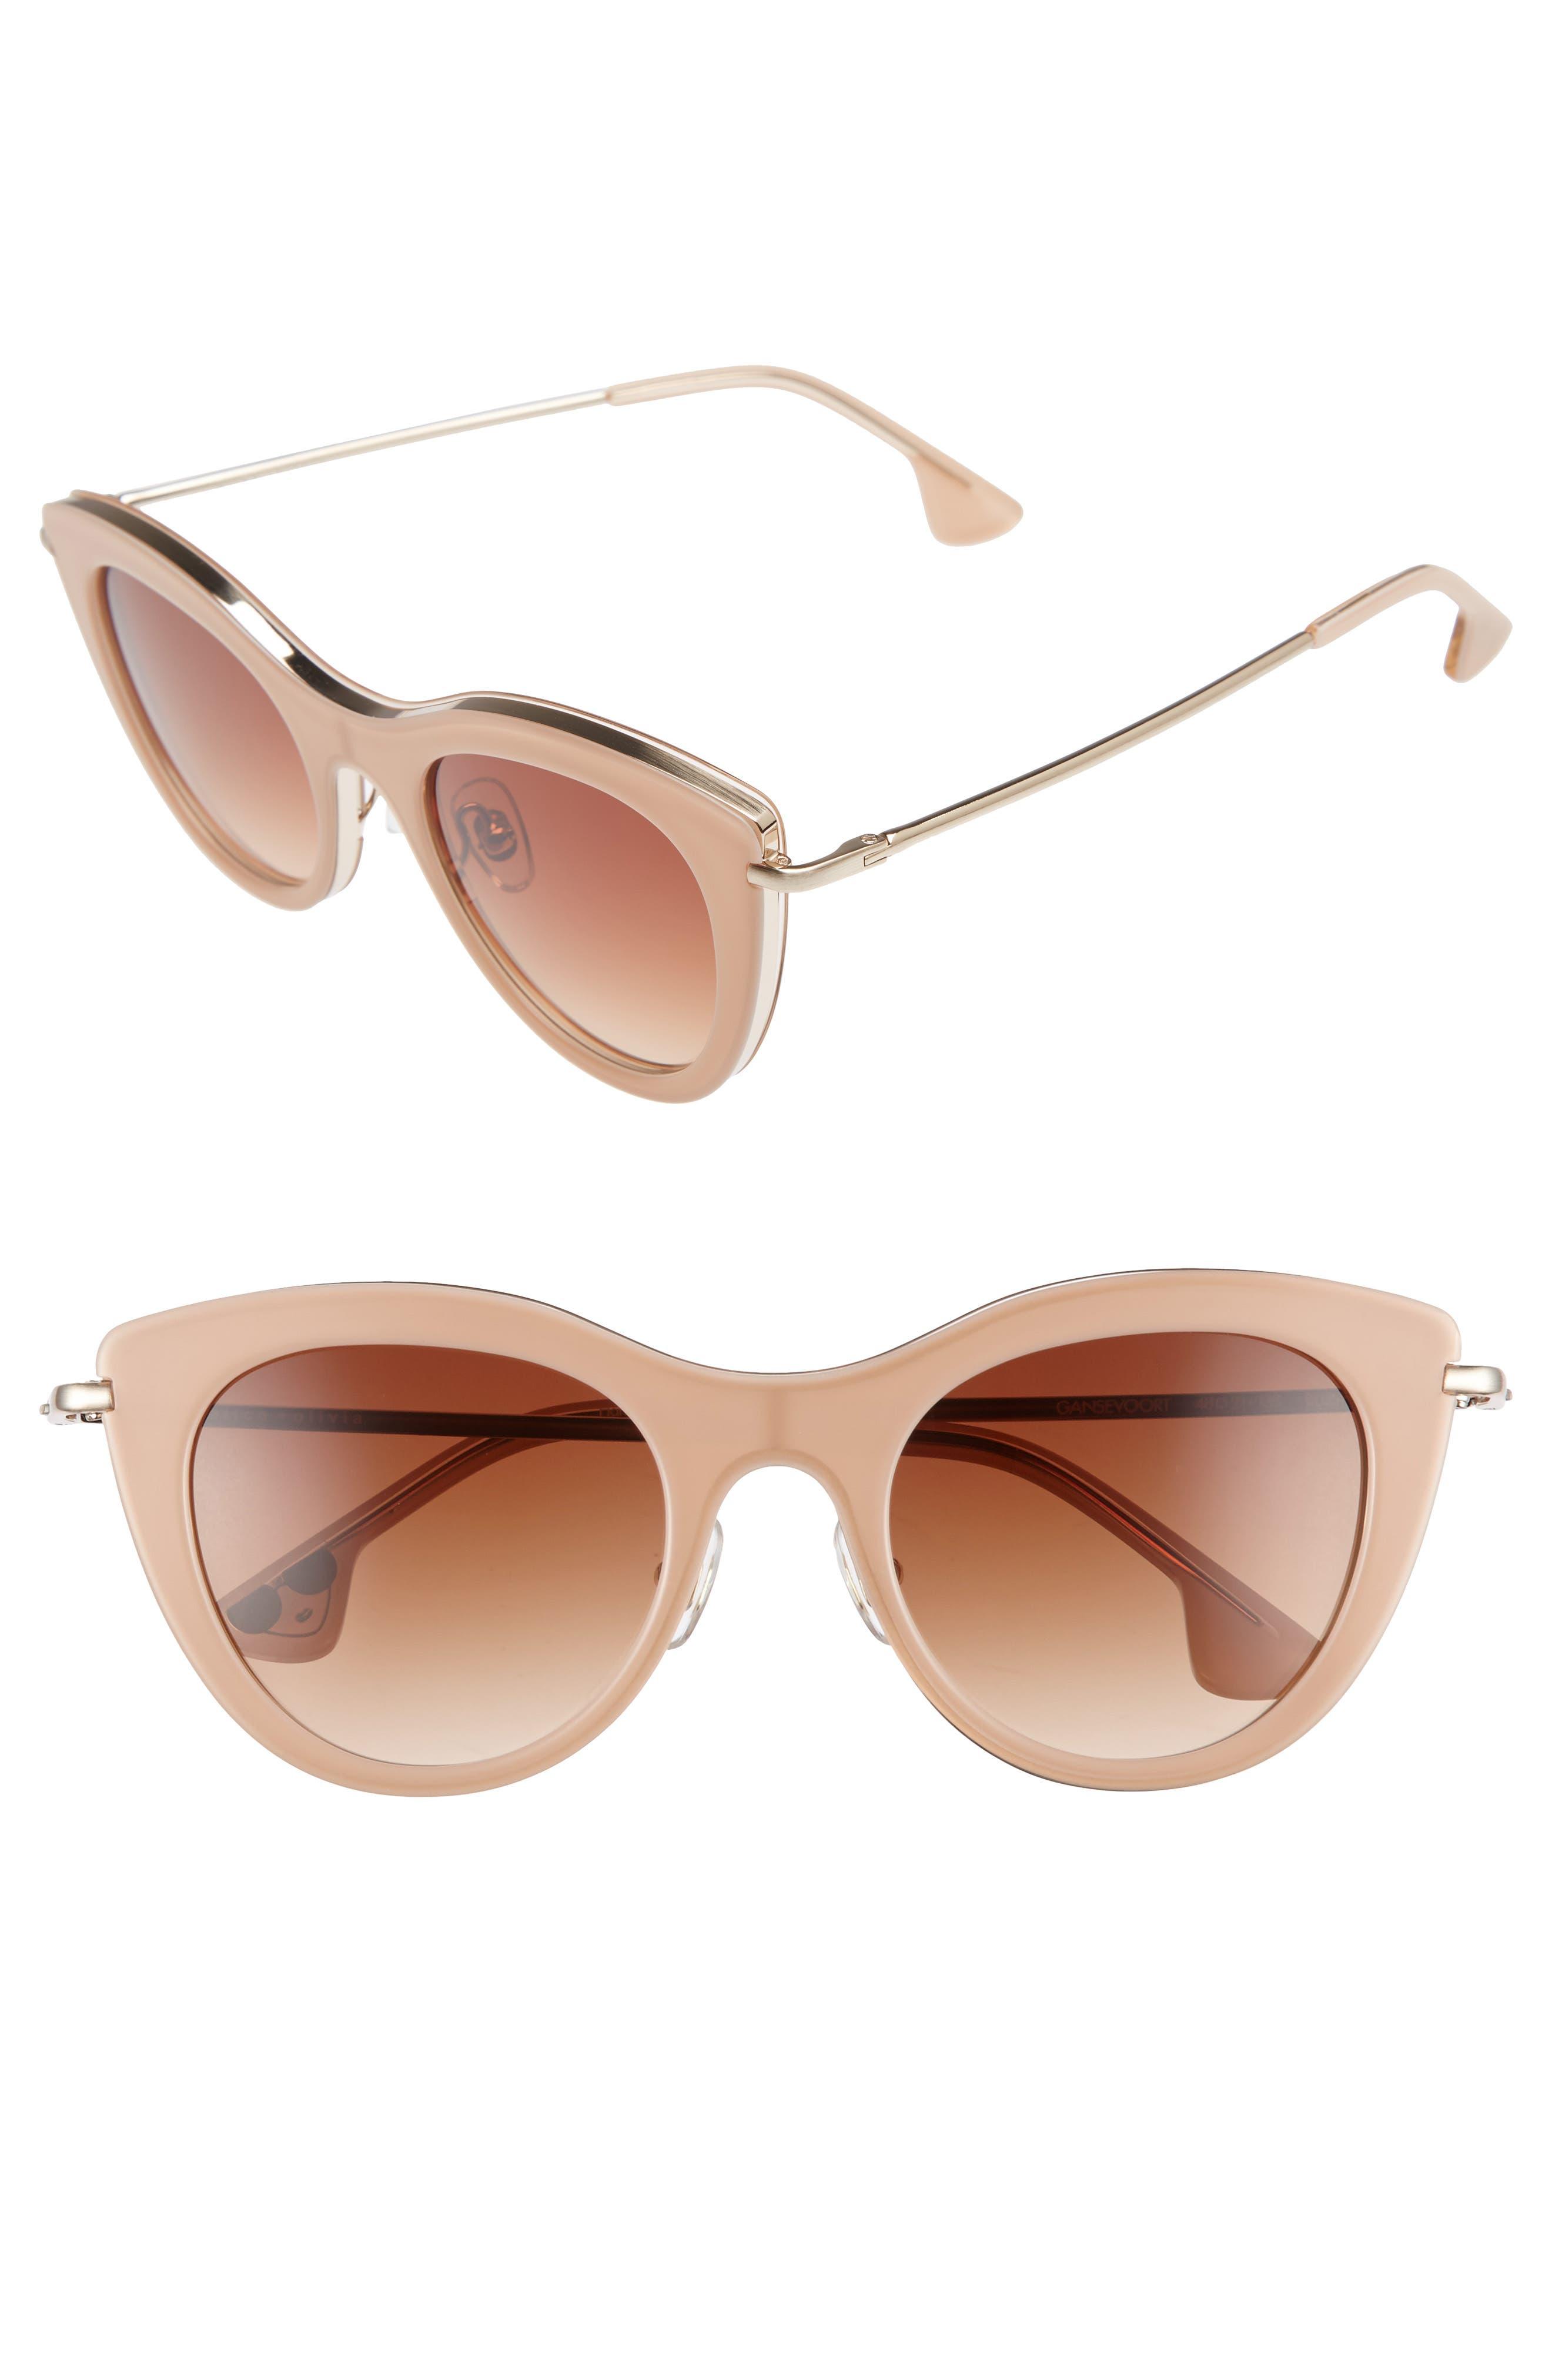 Gansevoort 48mm Special Fit Cat Eye Sunglasses,                         Main,                         color, Blush